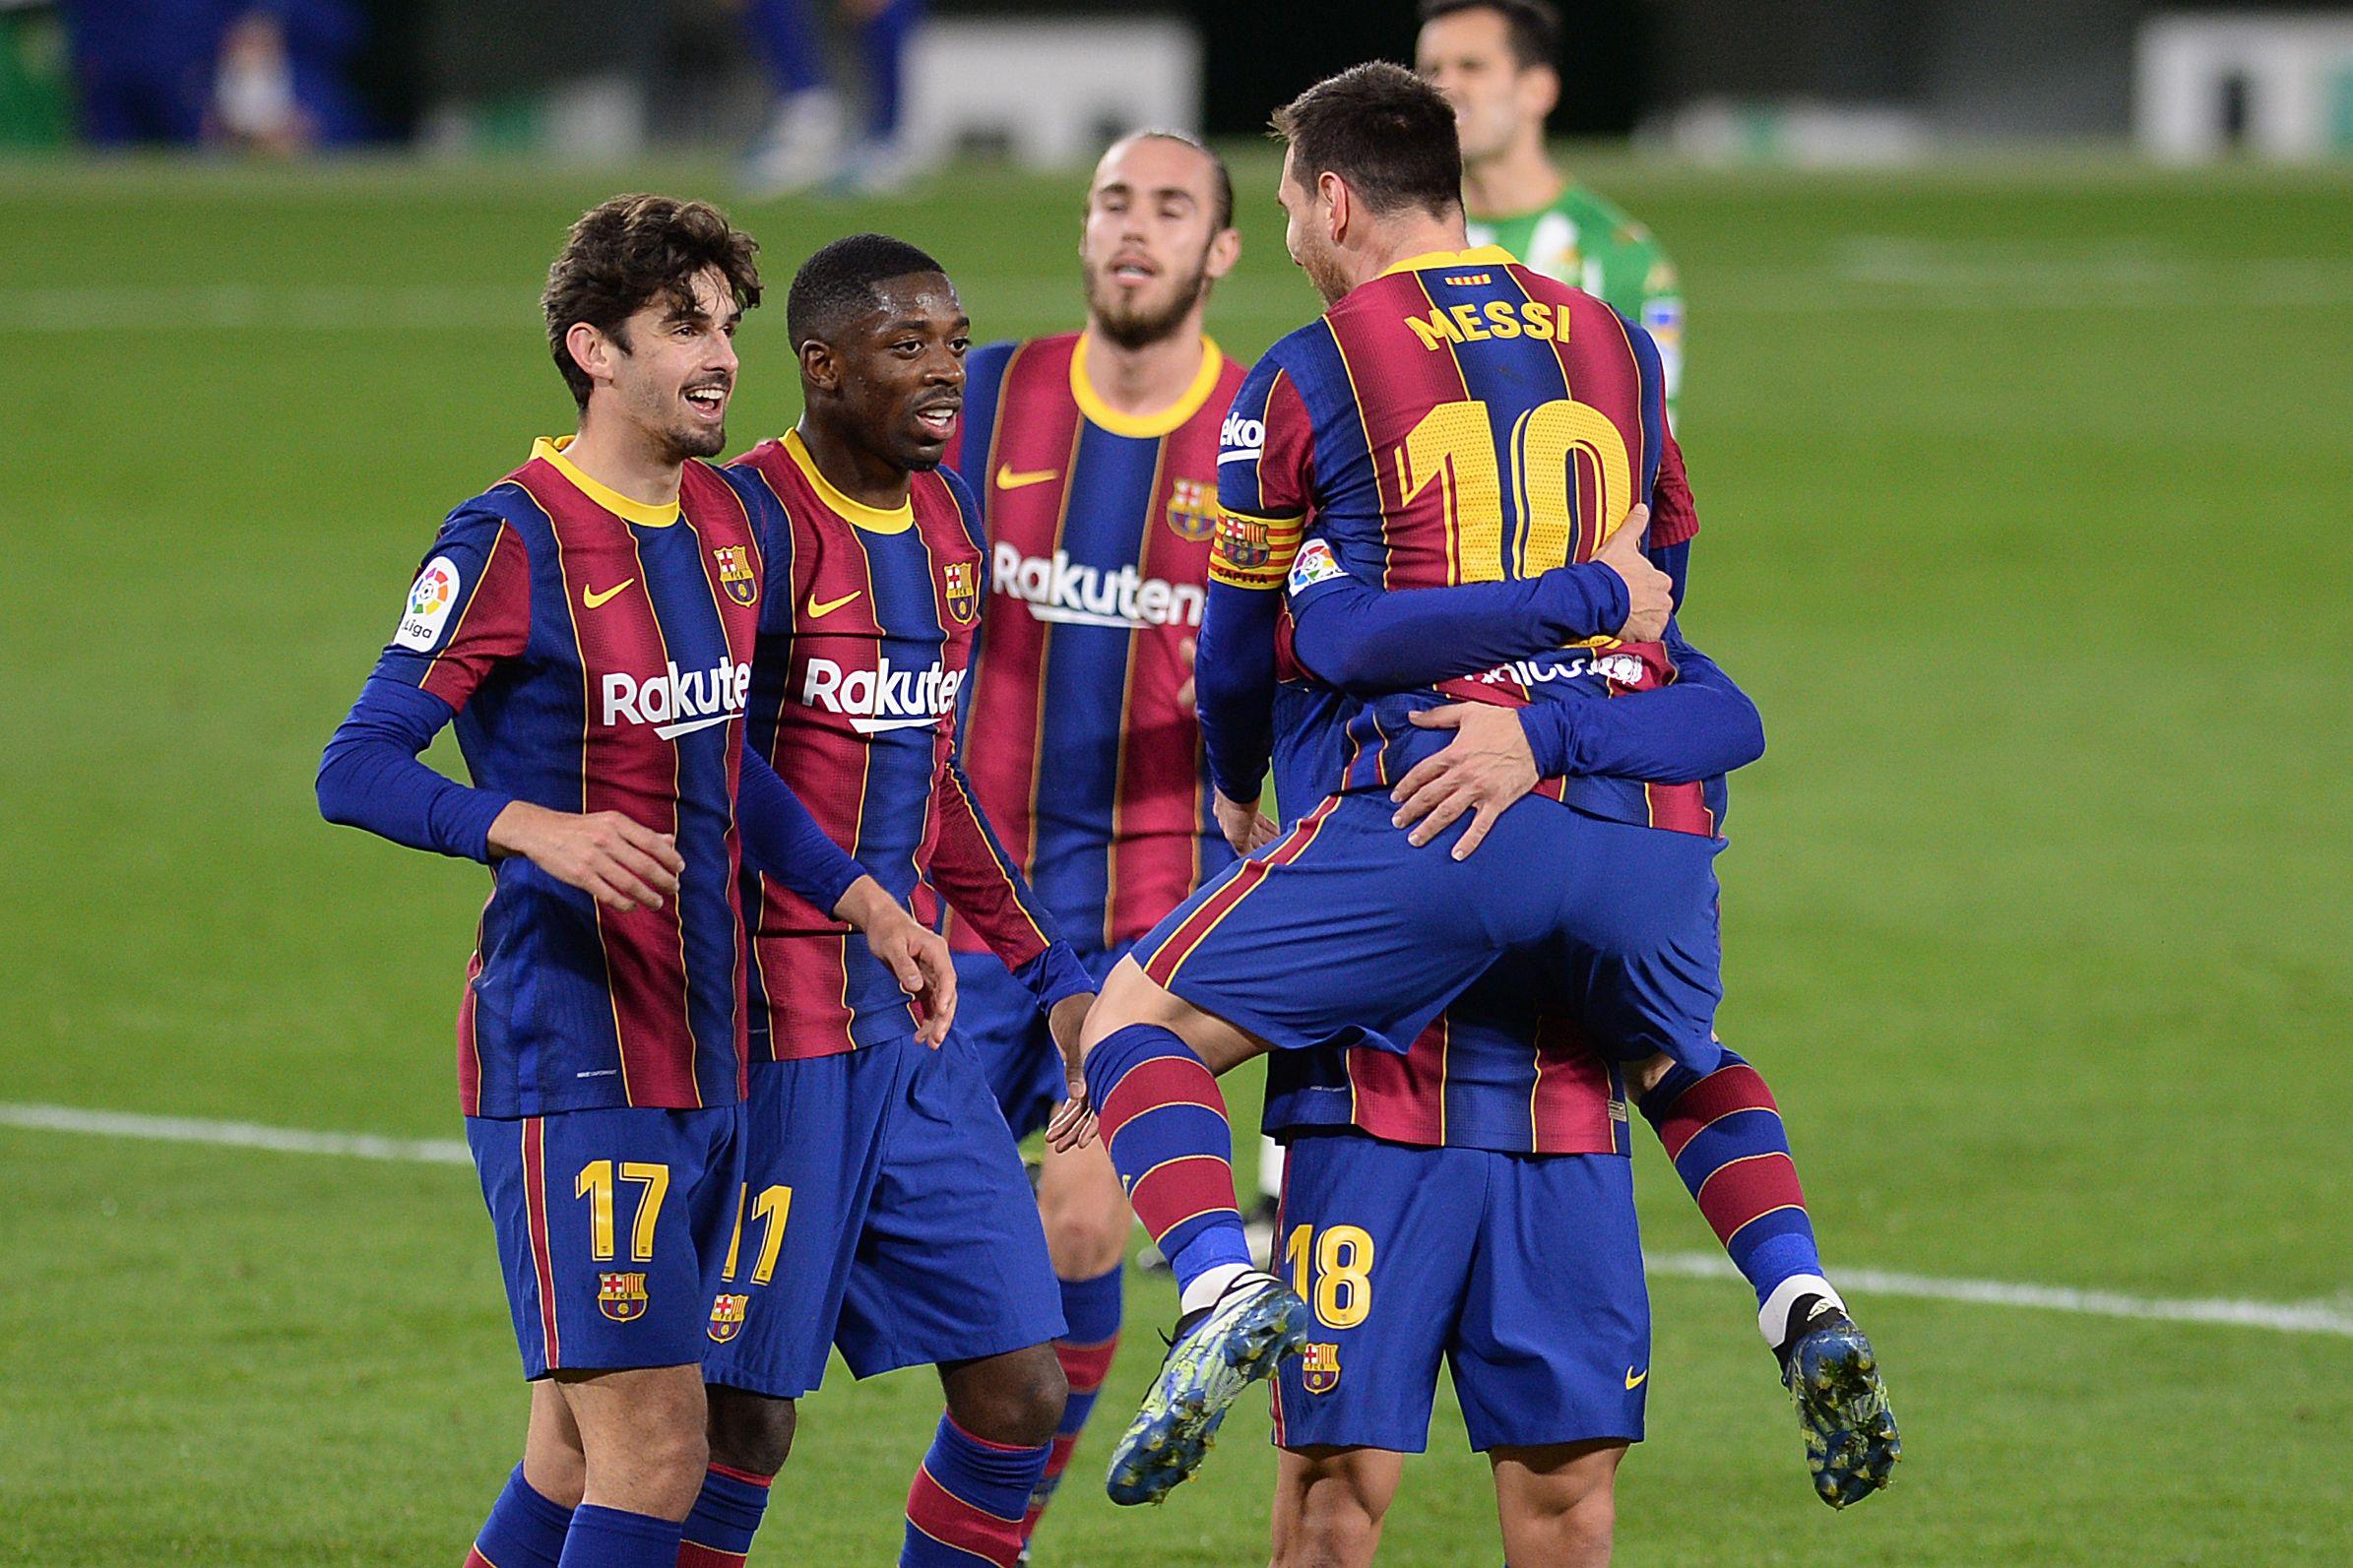 Barcelona fight back to seal vital 3-2 La Liga win at Real Betis